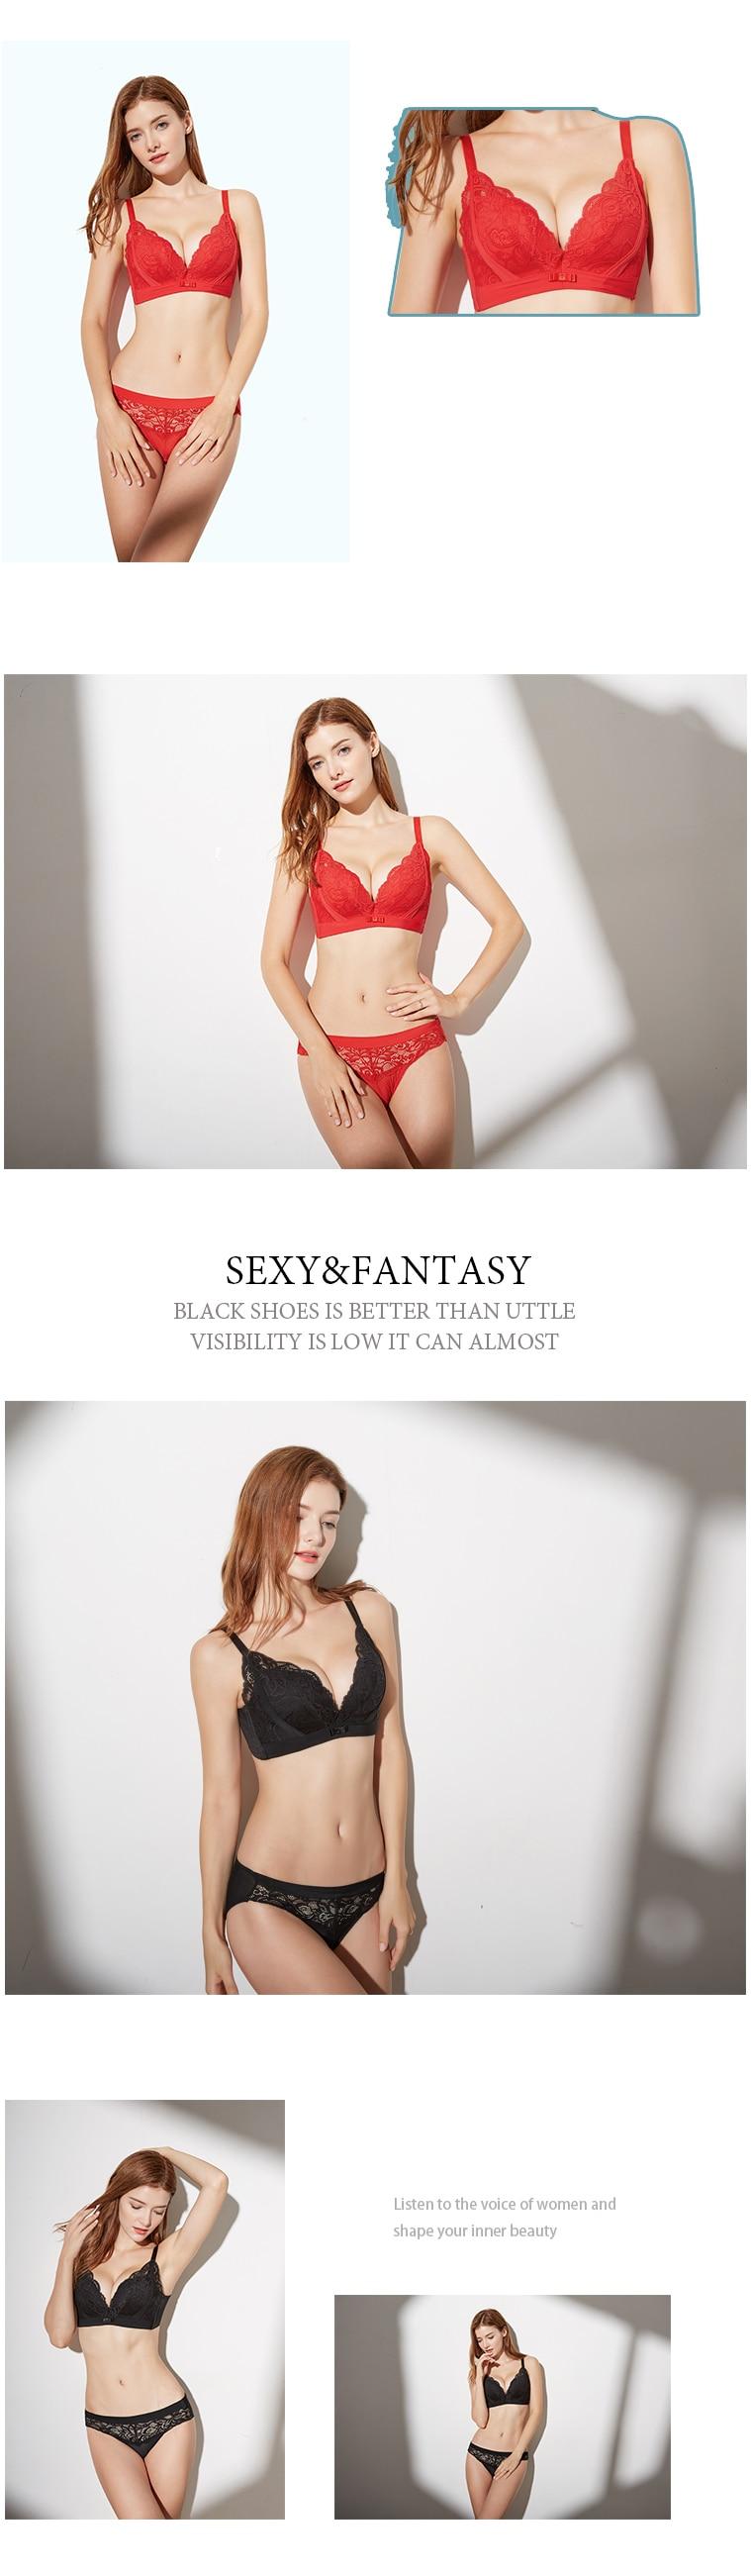 Shitagi 2017 Lace Underwire Bra Briefs Set Sexy Push Up B Cup Lady Underwear Lingerie Bra And Panty Set Transparent Bralette